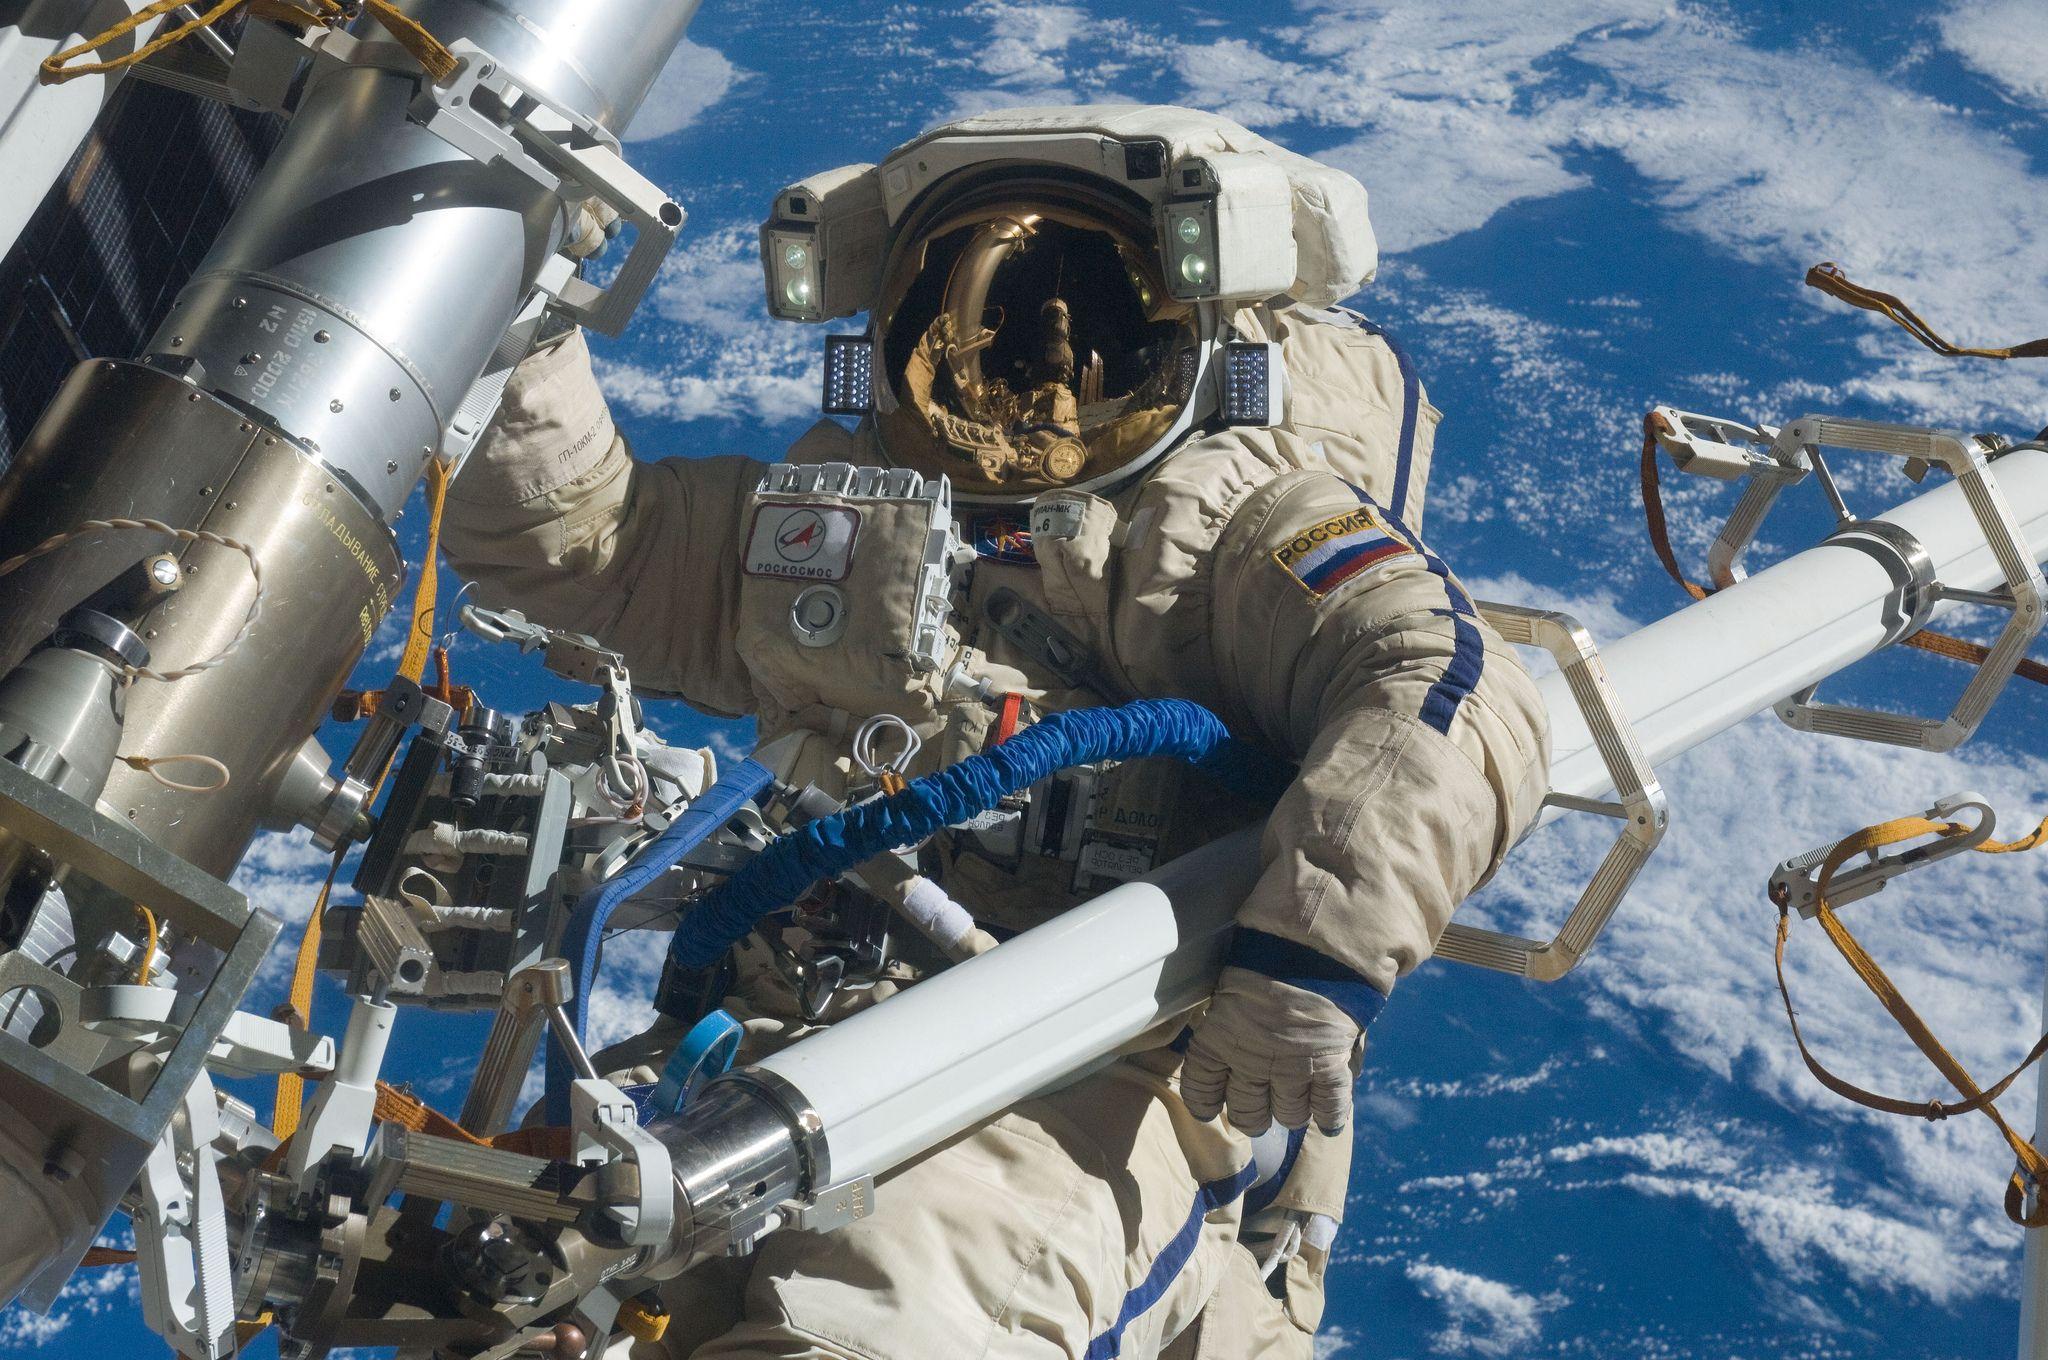 02_05_iss_astronaut_spacewalk